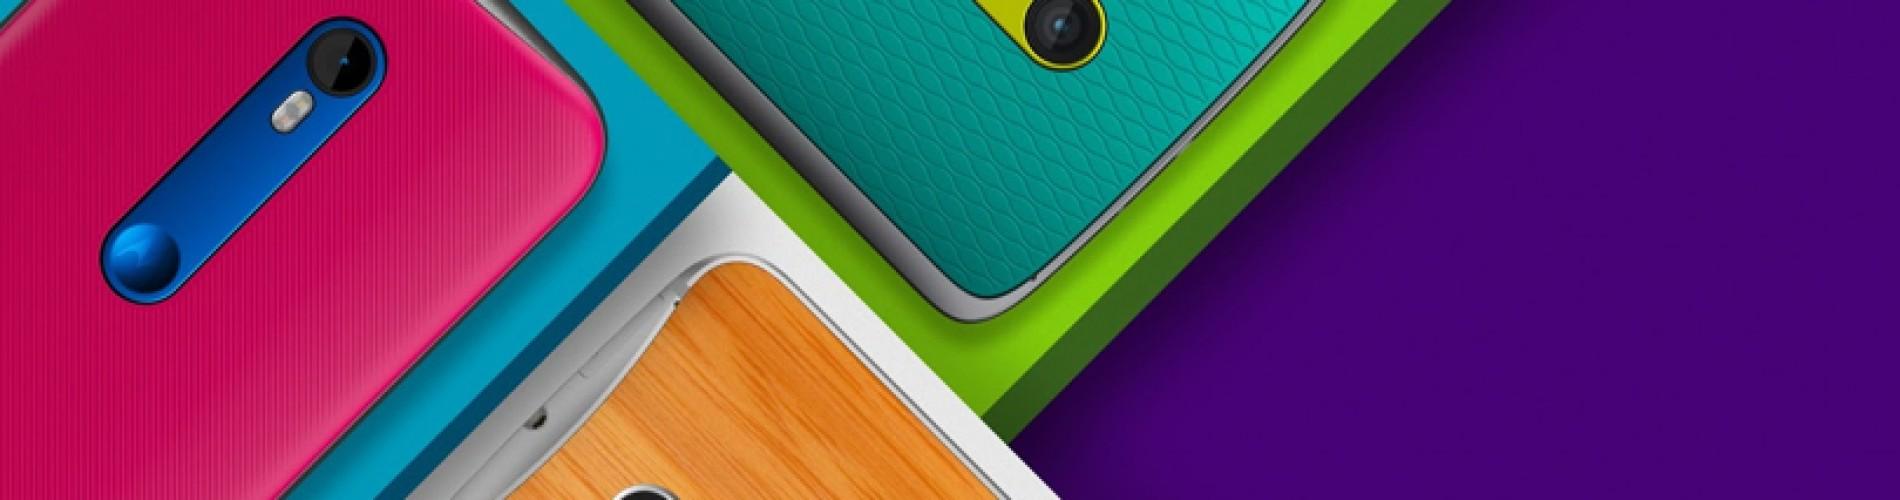 Motorola unwraps Moto G, Moto X Play, and Moto X Style